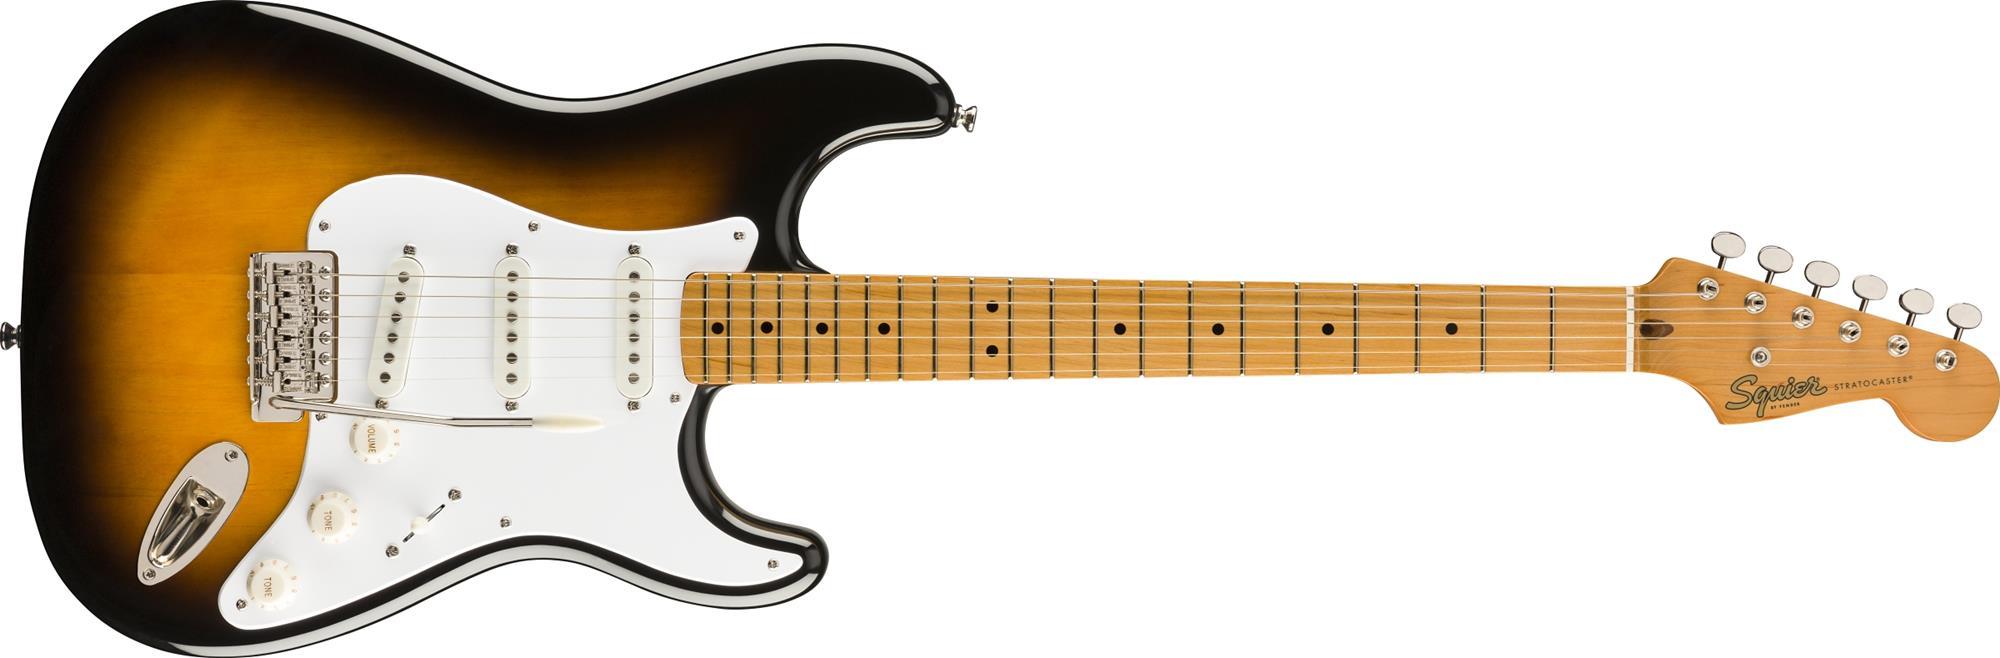 SQUIER-Classic-Vibe-50s-Stratocaster-MN-2-Color-Sunburst-0374005500-sku-24484